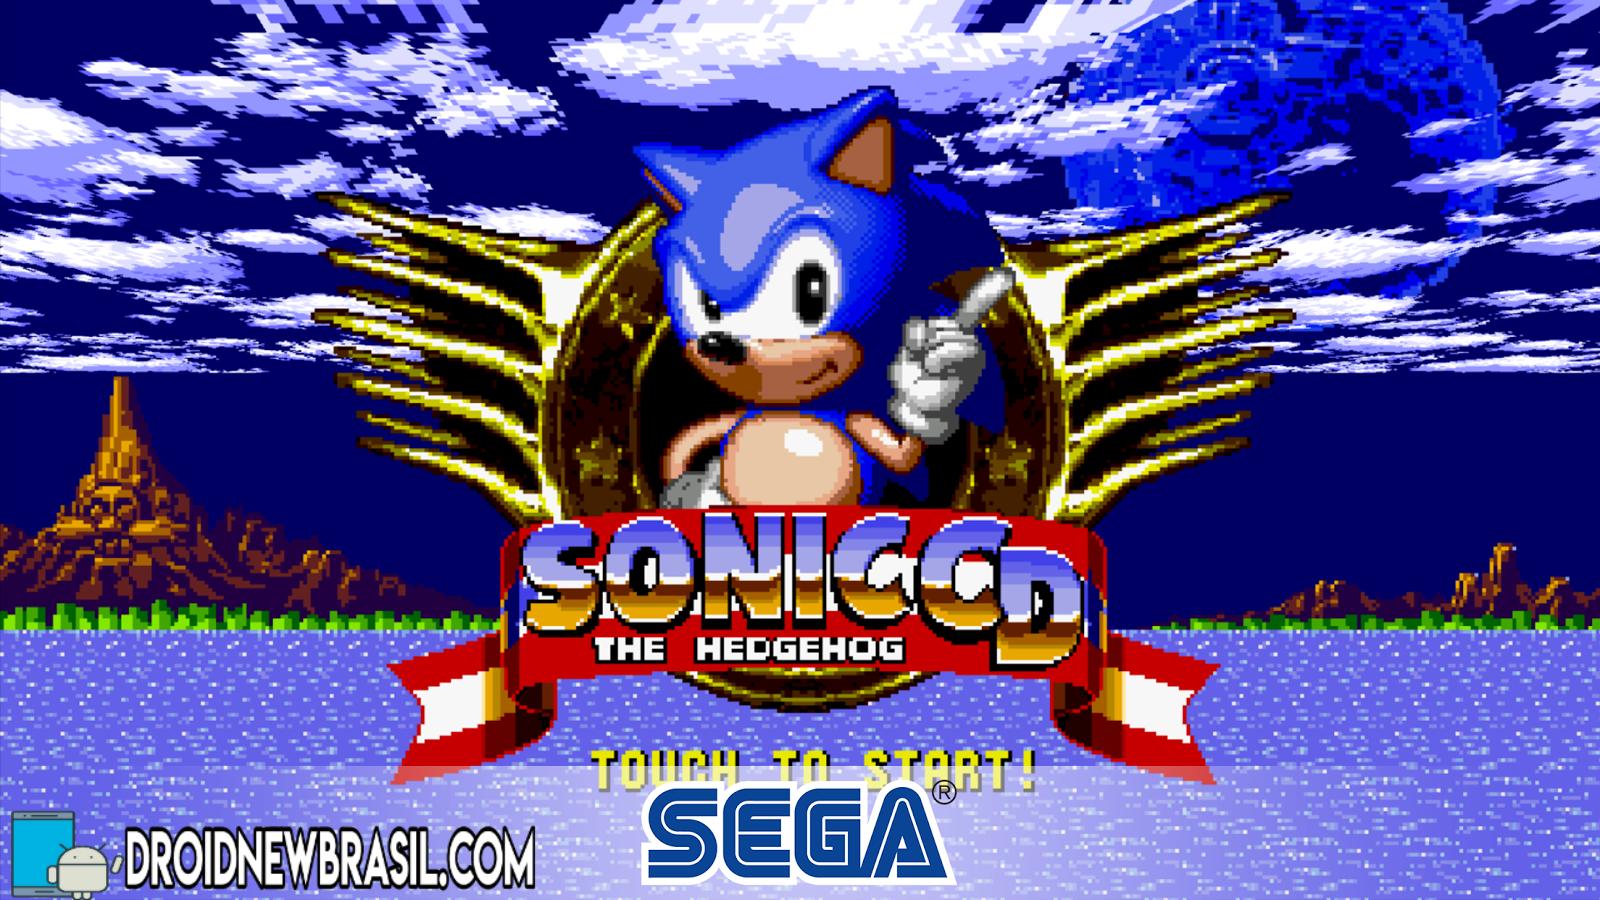 Sonic CD Classic v1.0.2 Apk – OBB